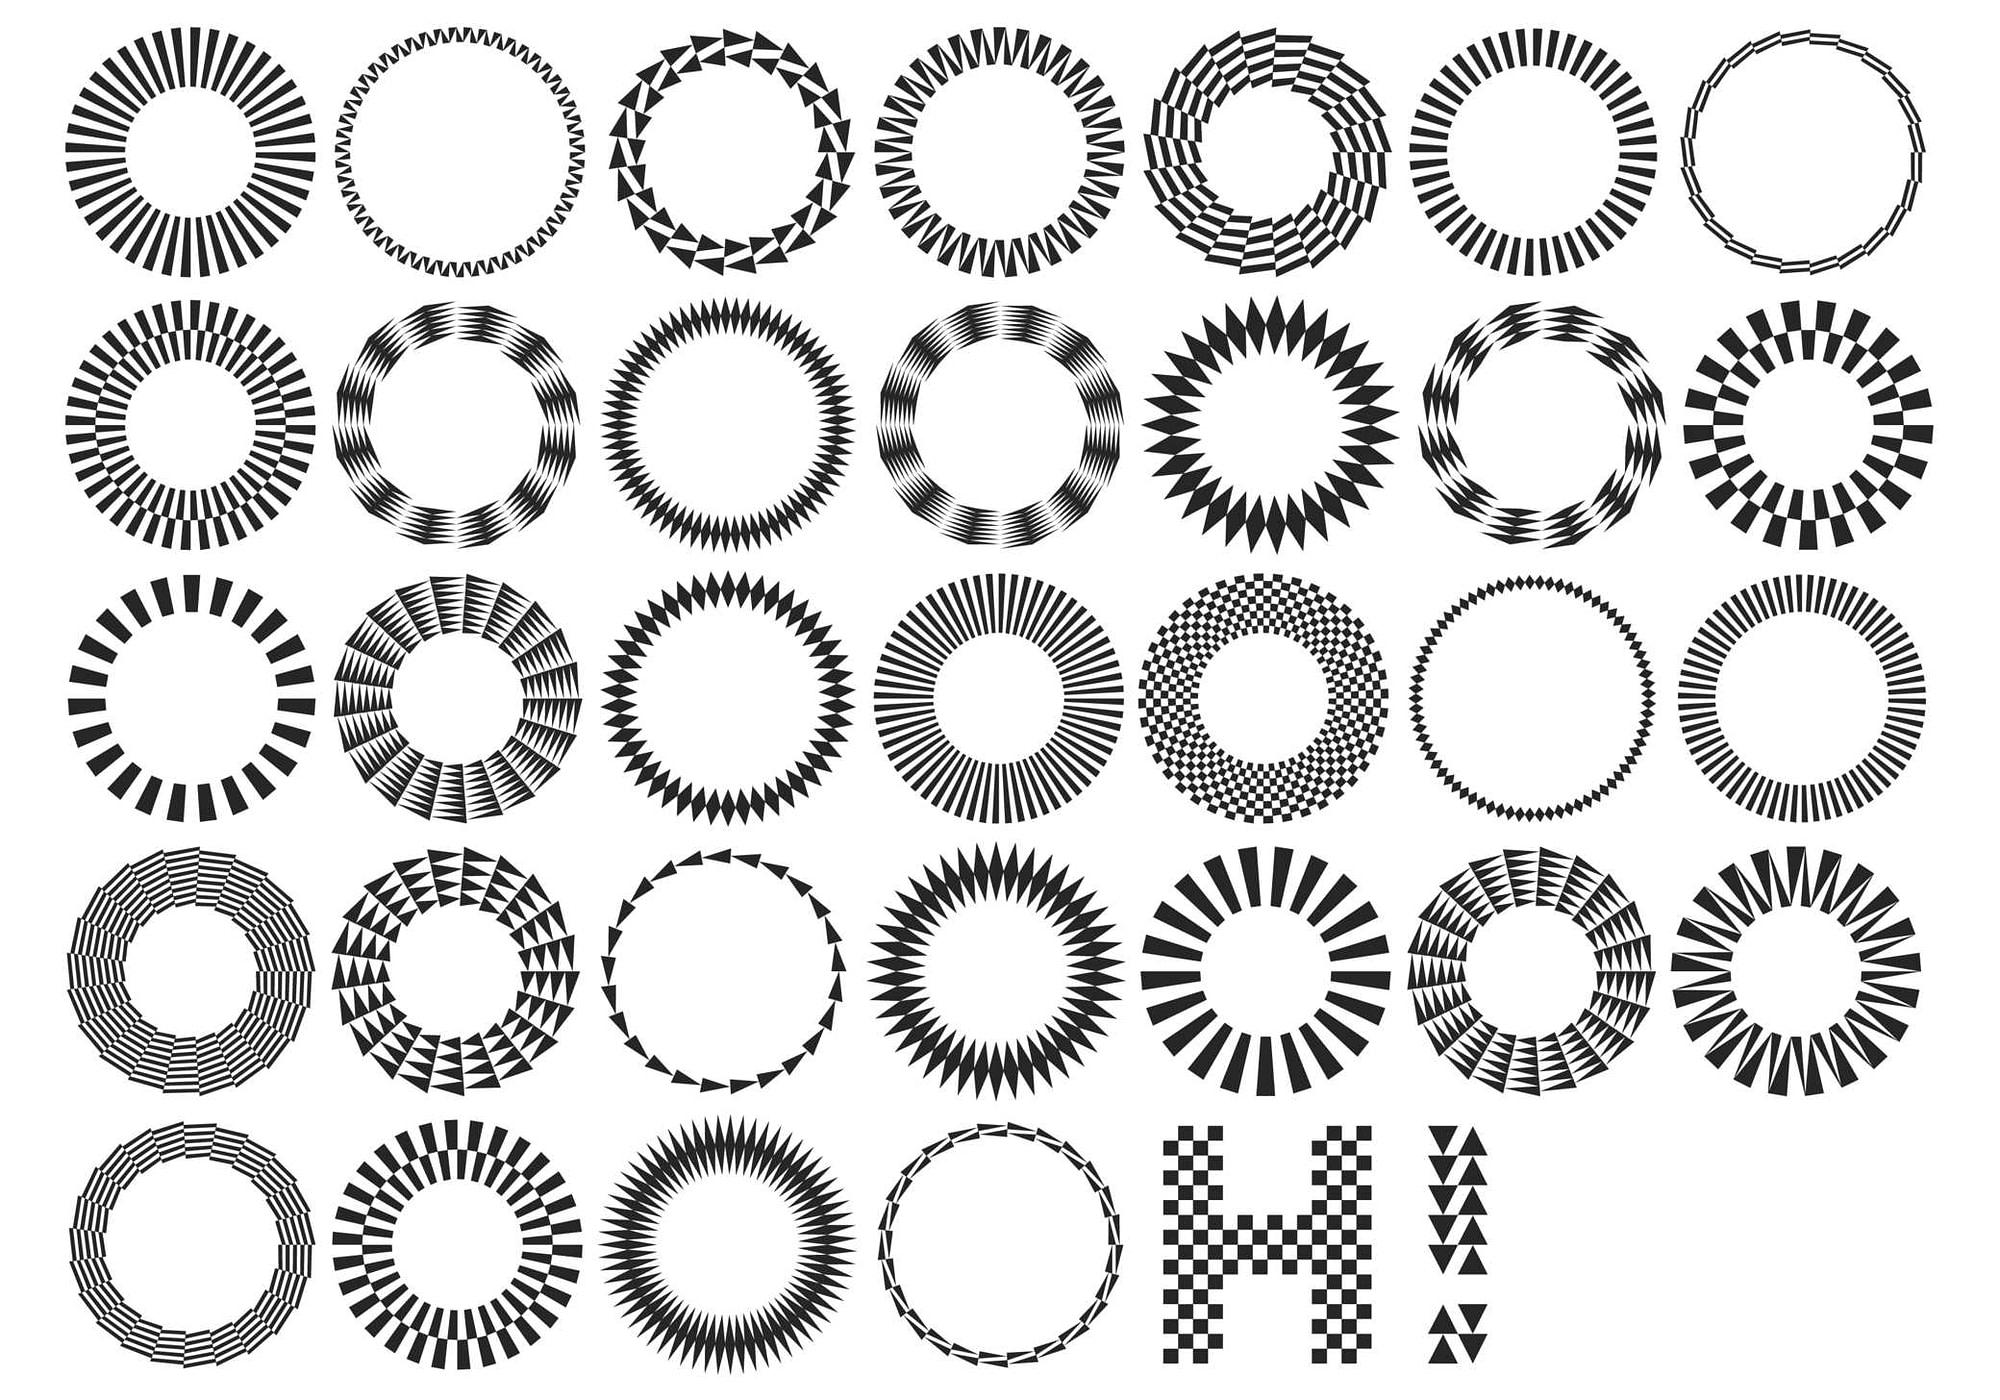 pattern-project-landscape-00-2080x1455px